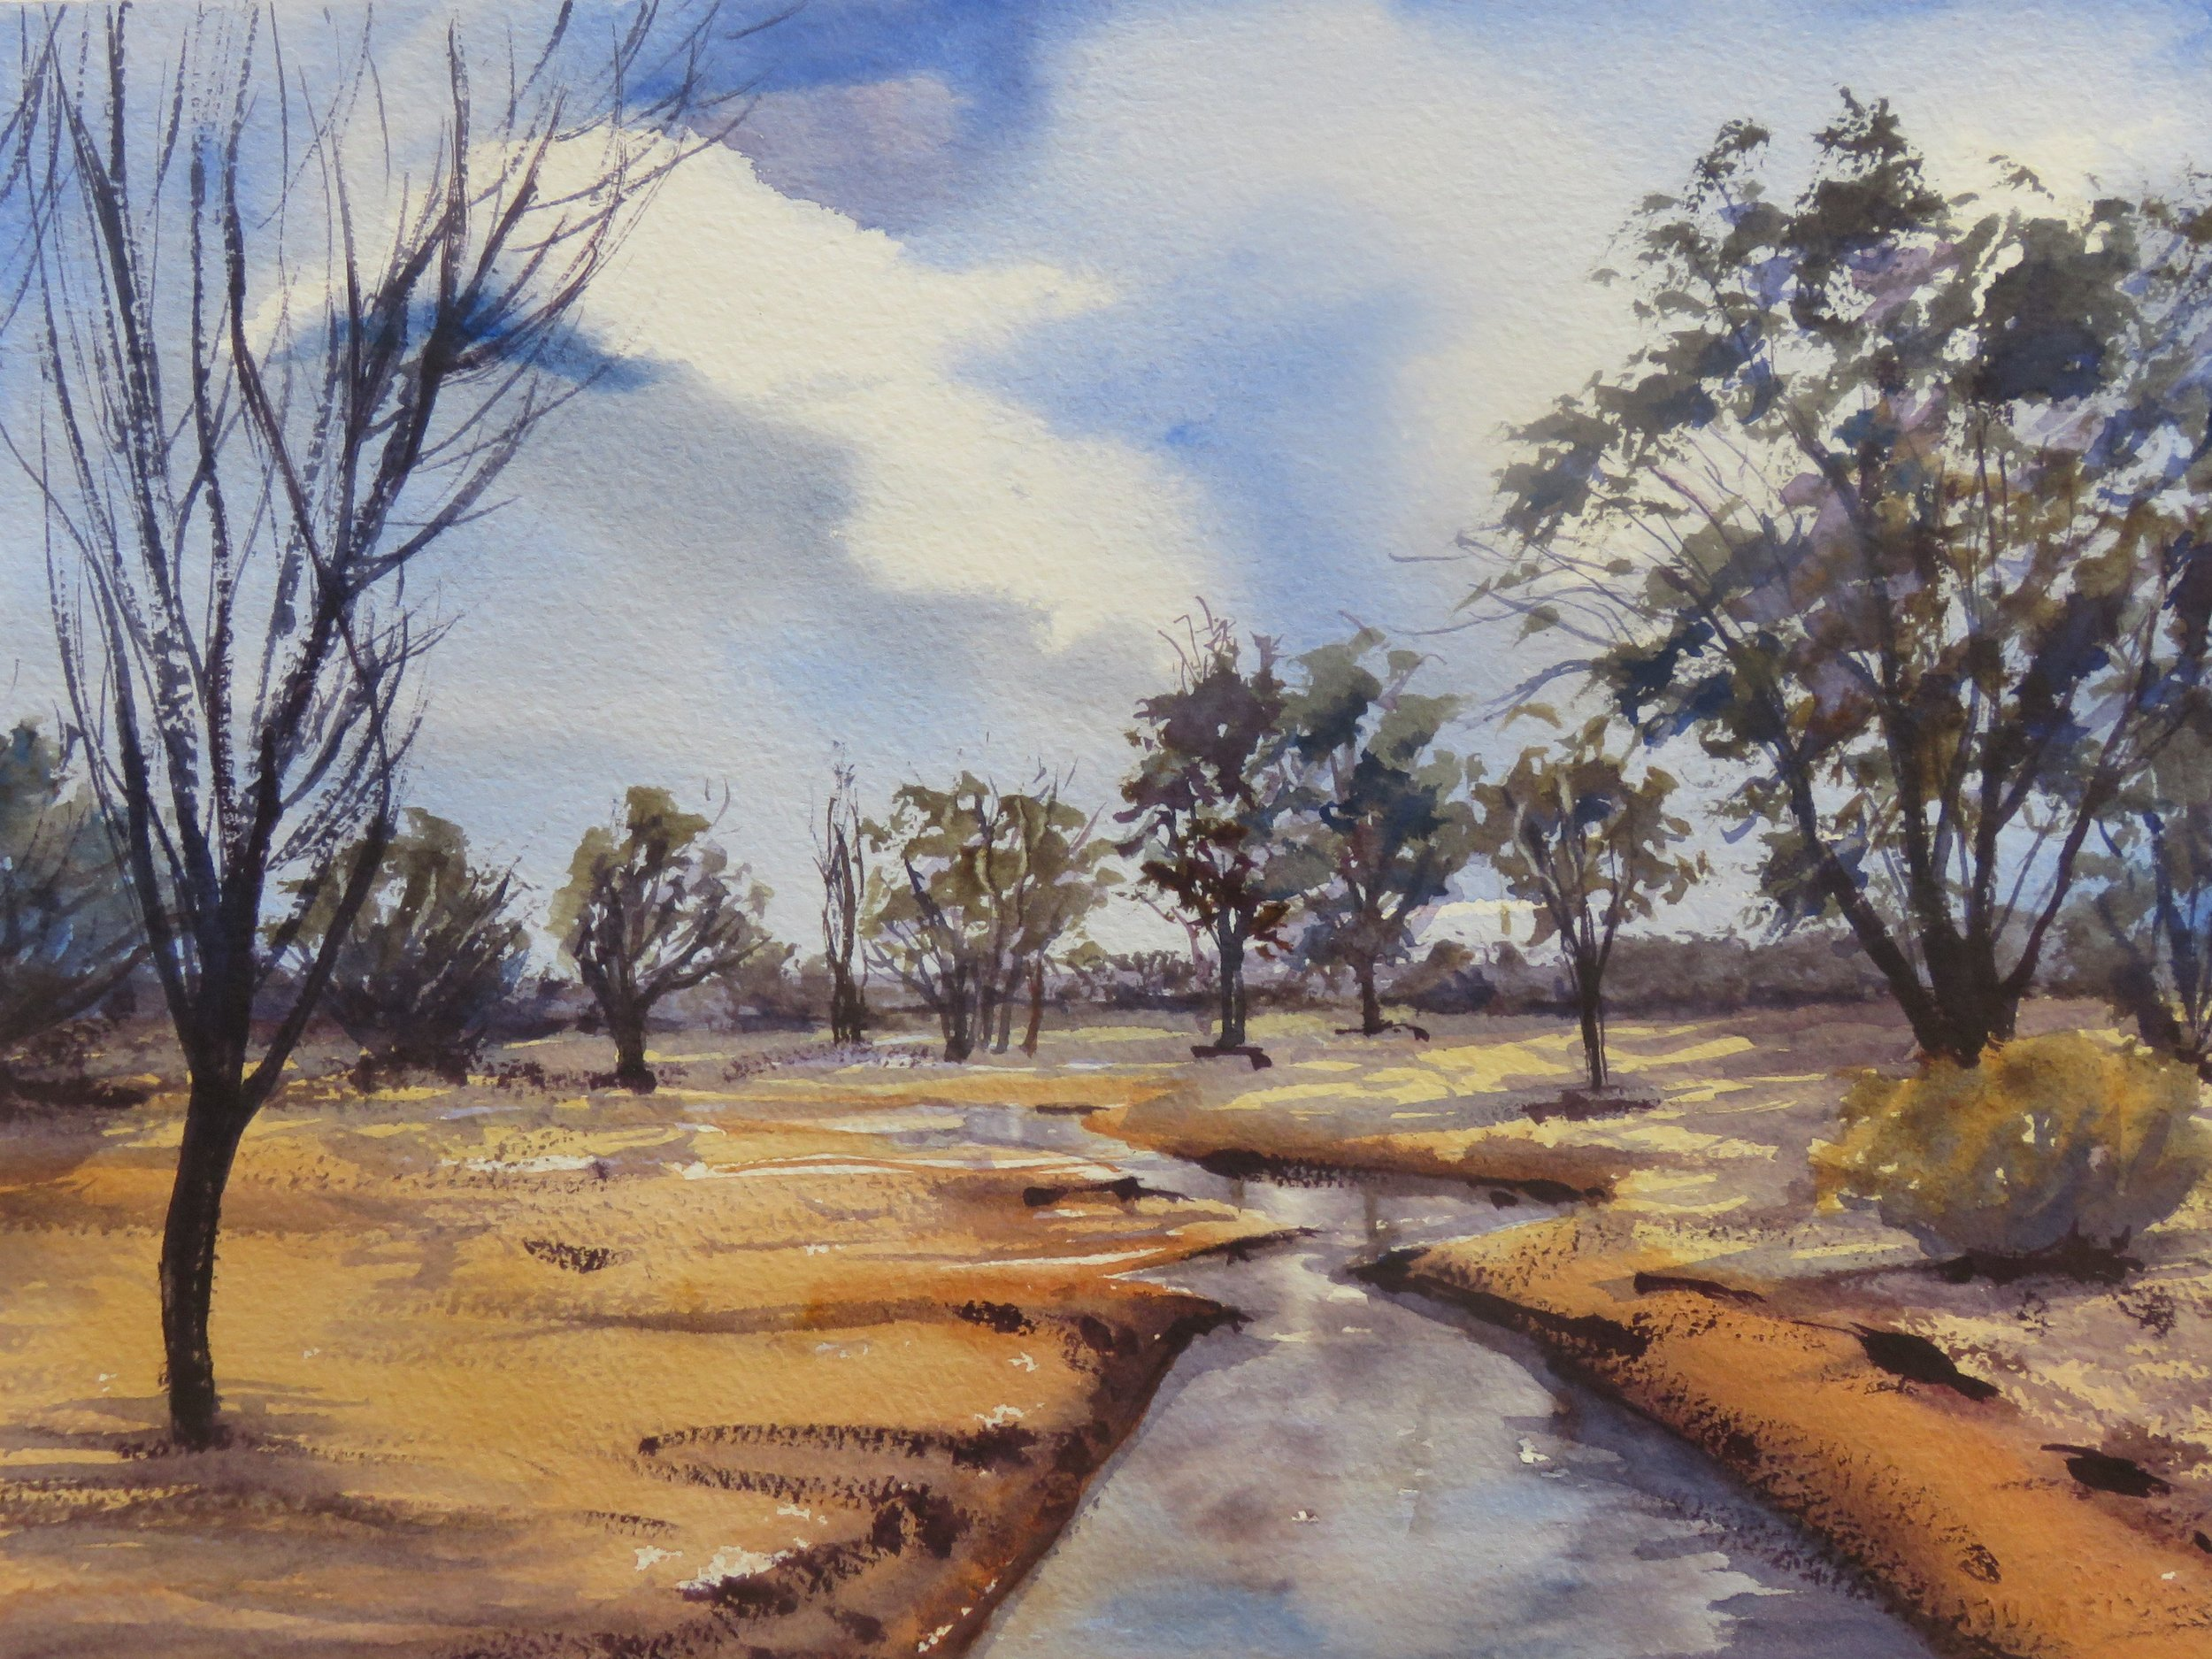 Country Scene  36cm x 26cm  Original Watercolour   Unframed   $150